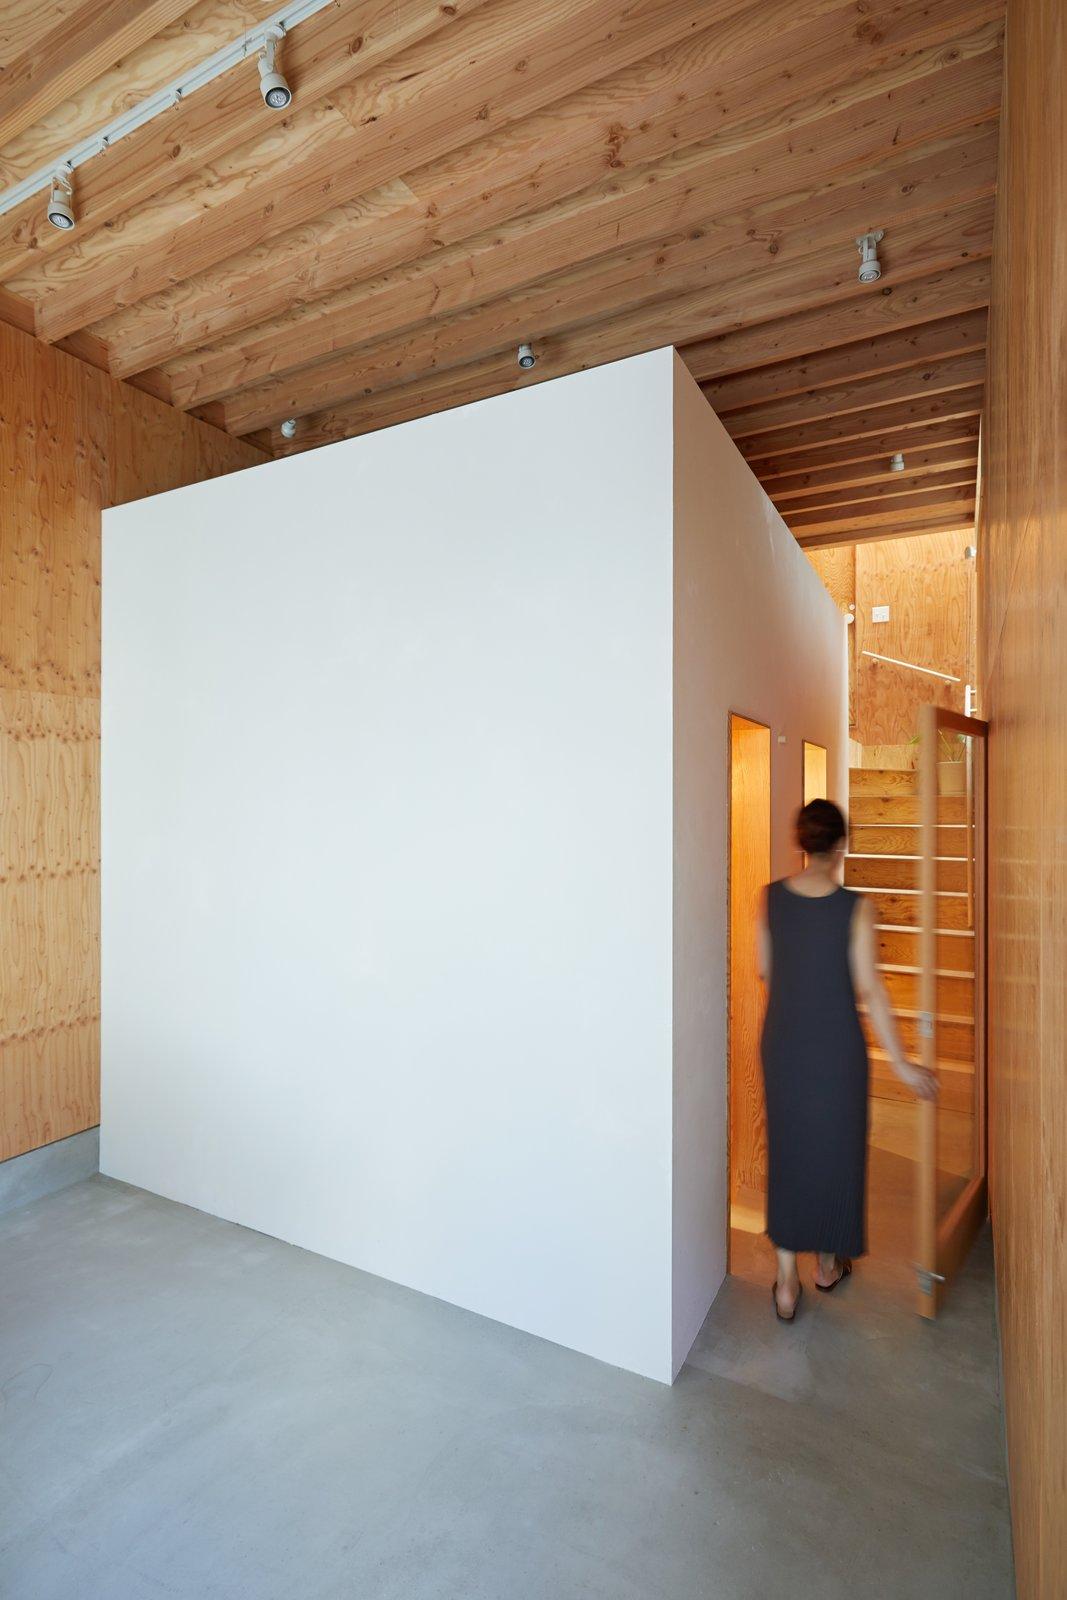 Milk Carton House Tenhachi Architect and Interior Design hallway